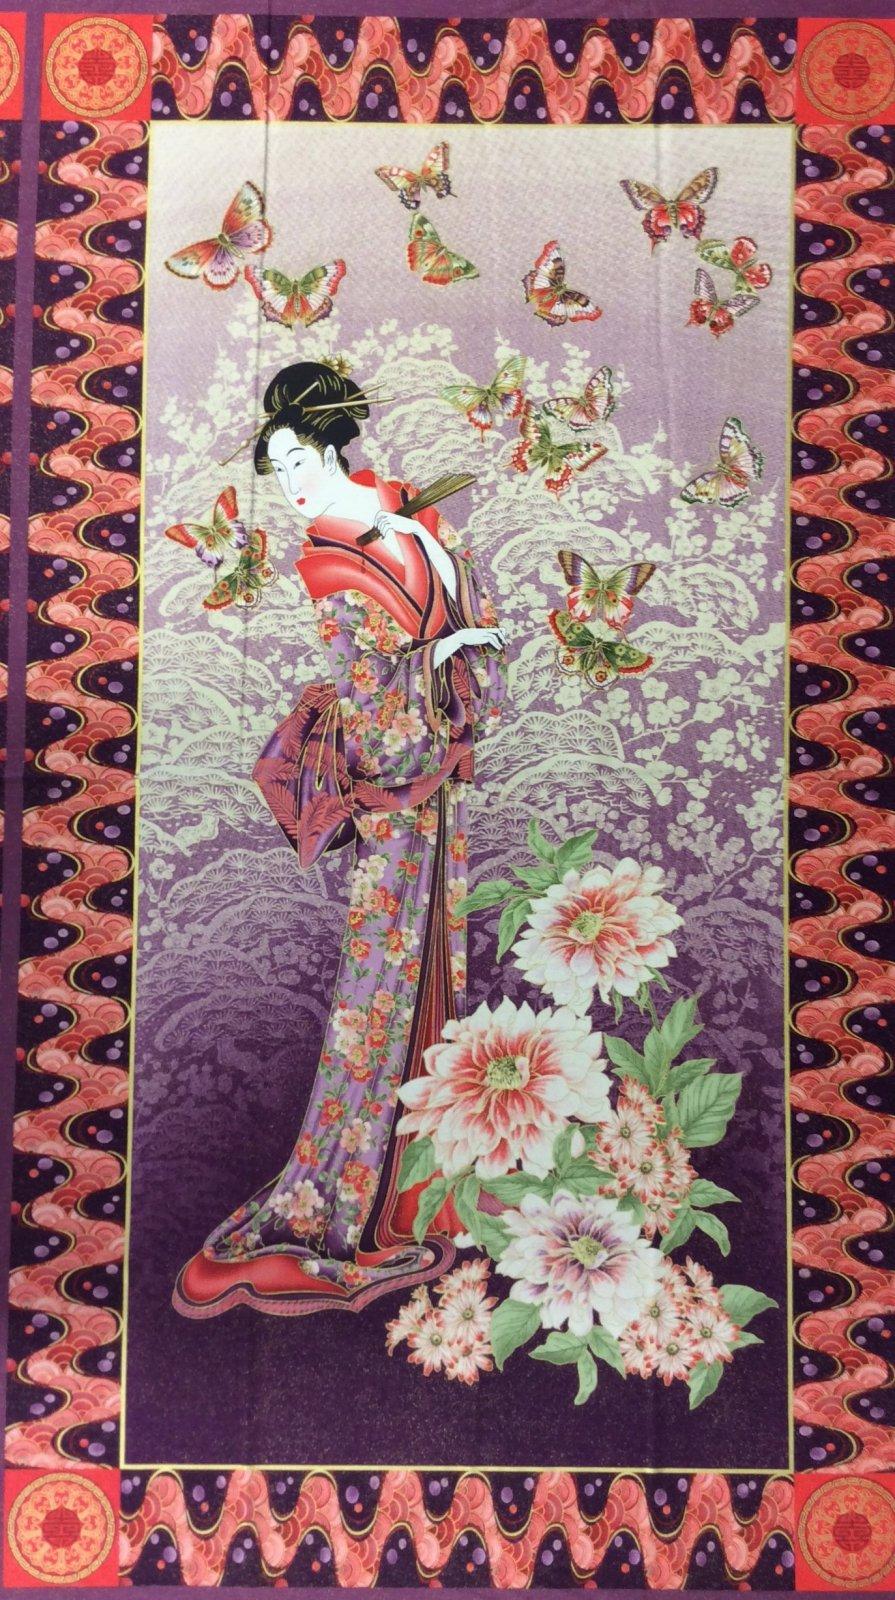 Geisha Wood Block Print Japanese Elegant Kimono PANEL Cotton Quilting Fabric PNL36 MD91